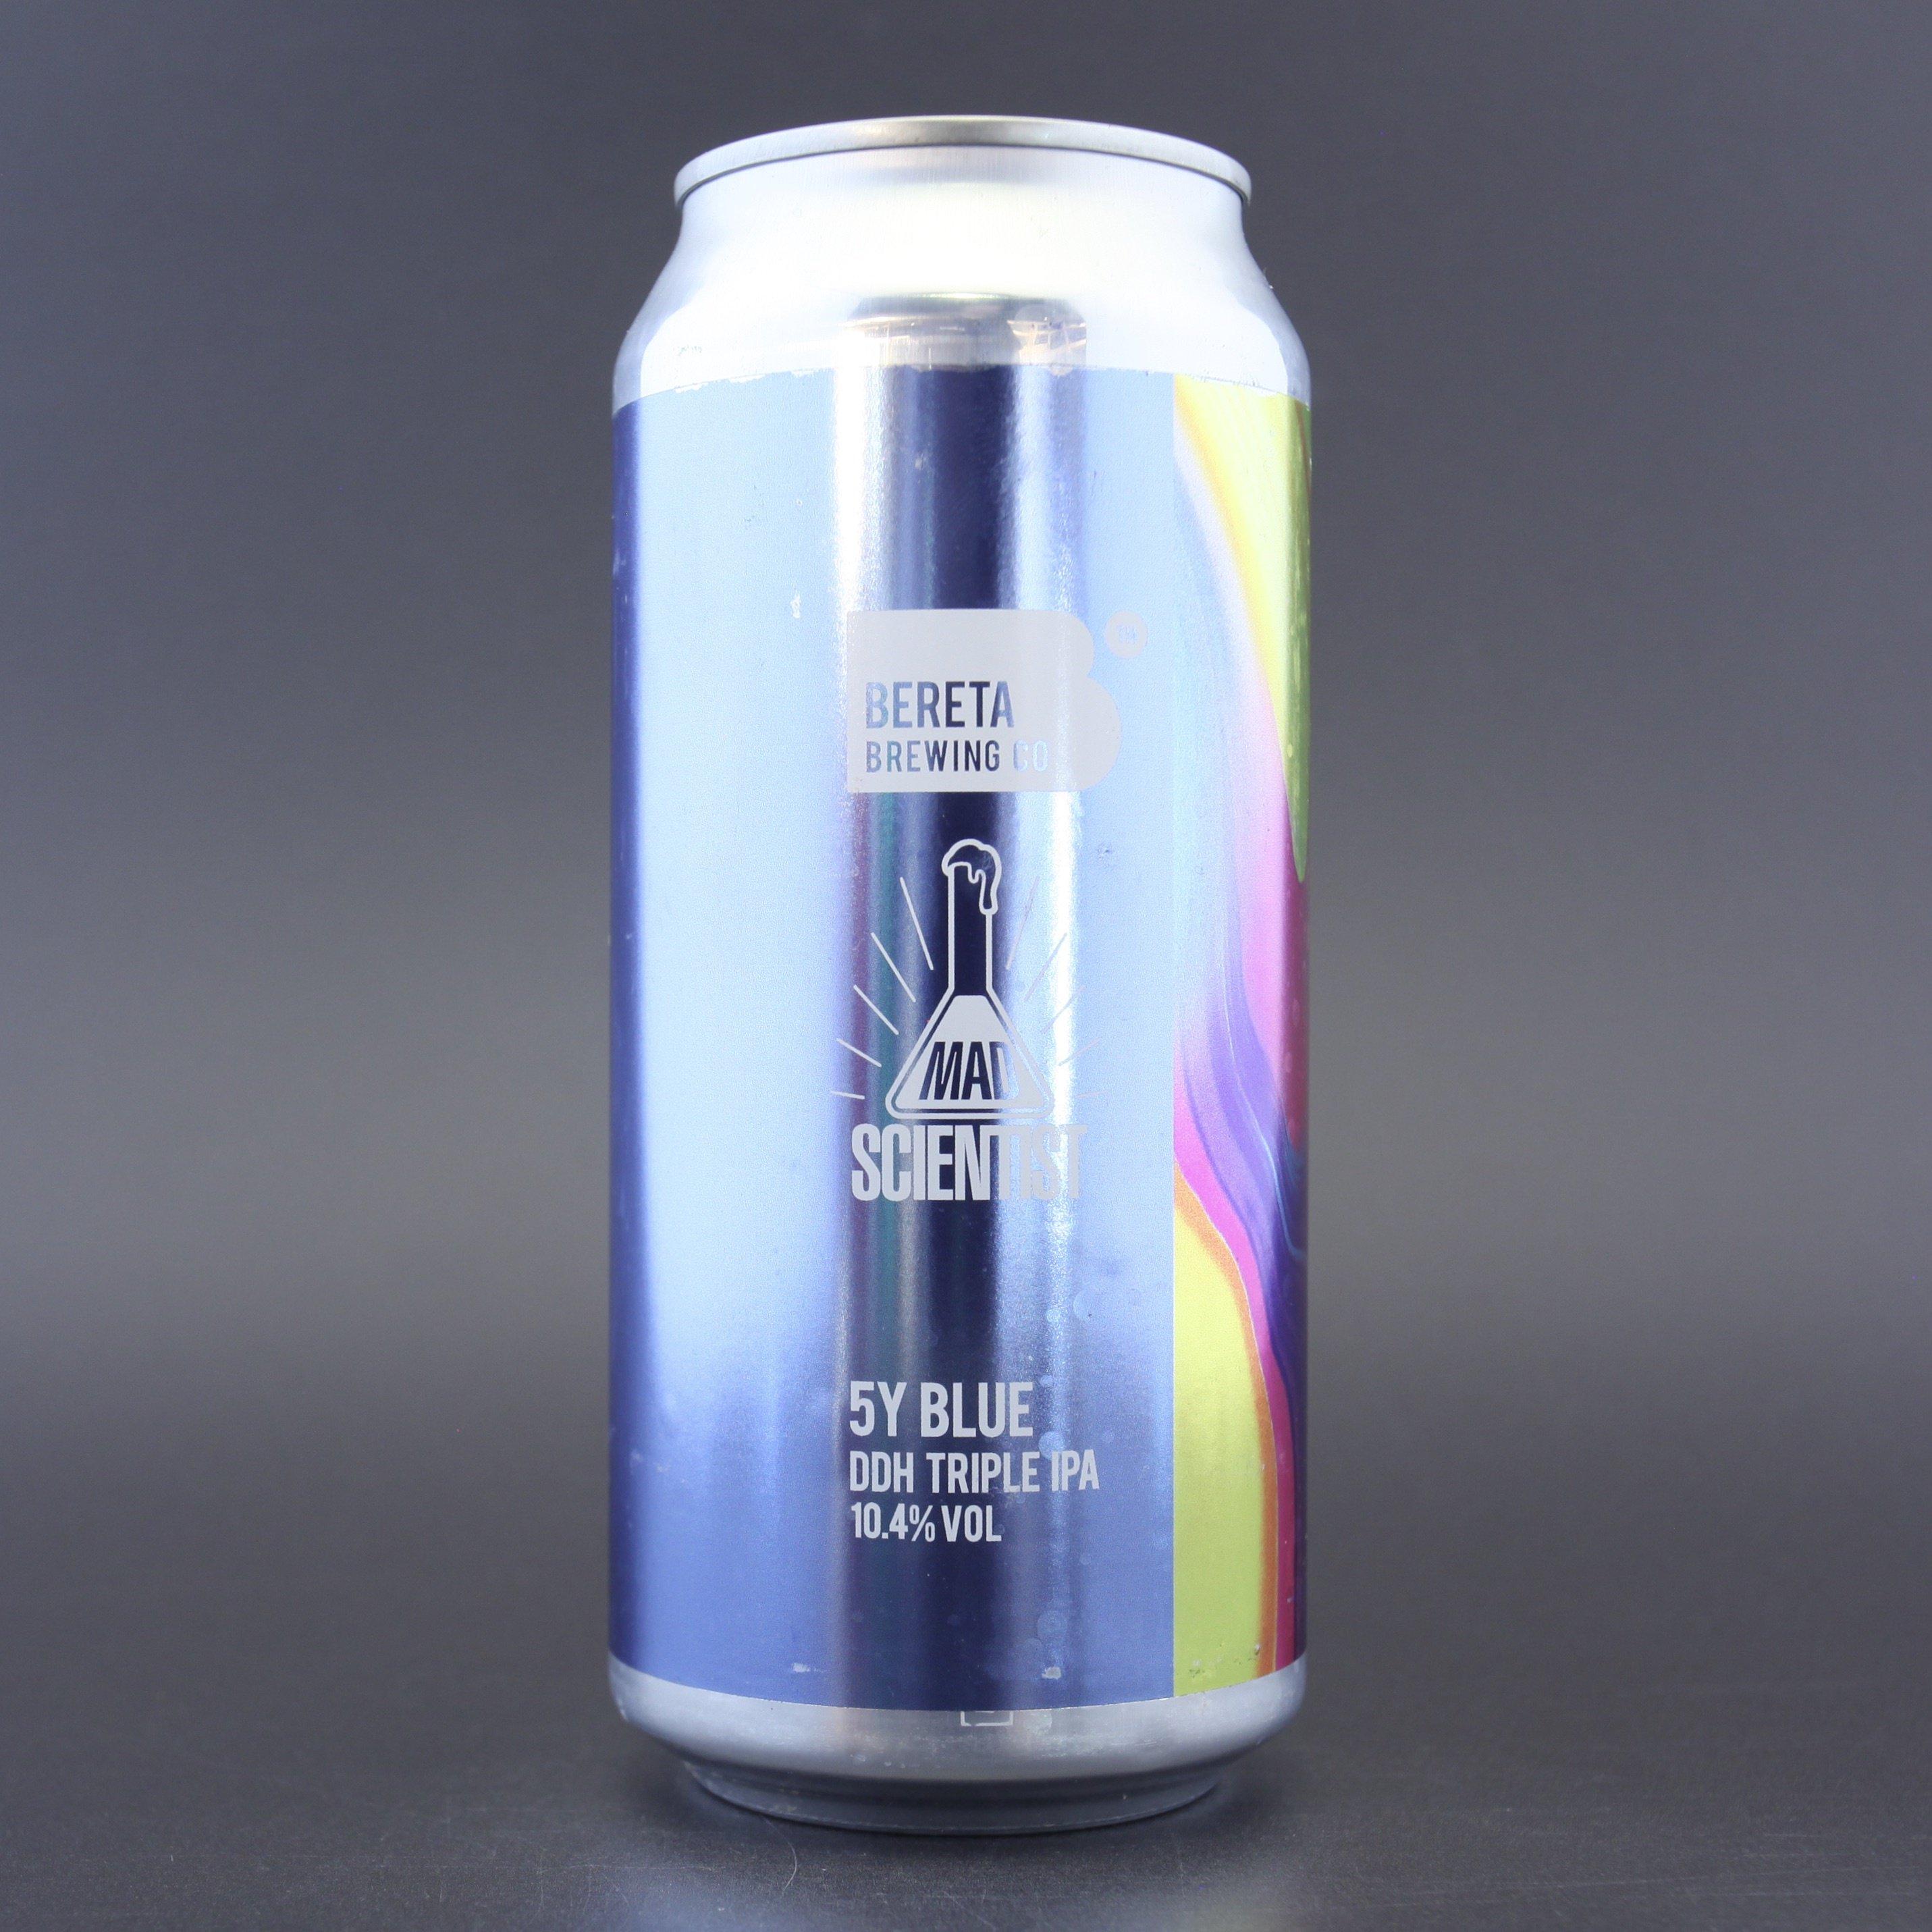 Bereta x Mad Scientist   5Y Blue   DDH Triple IPA 10.4% 440ml